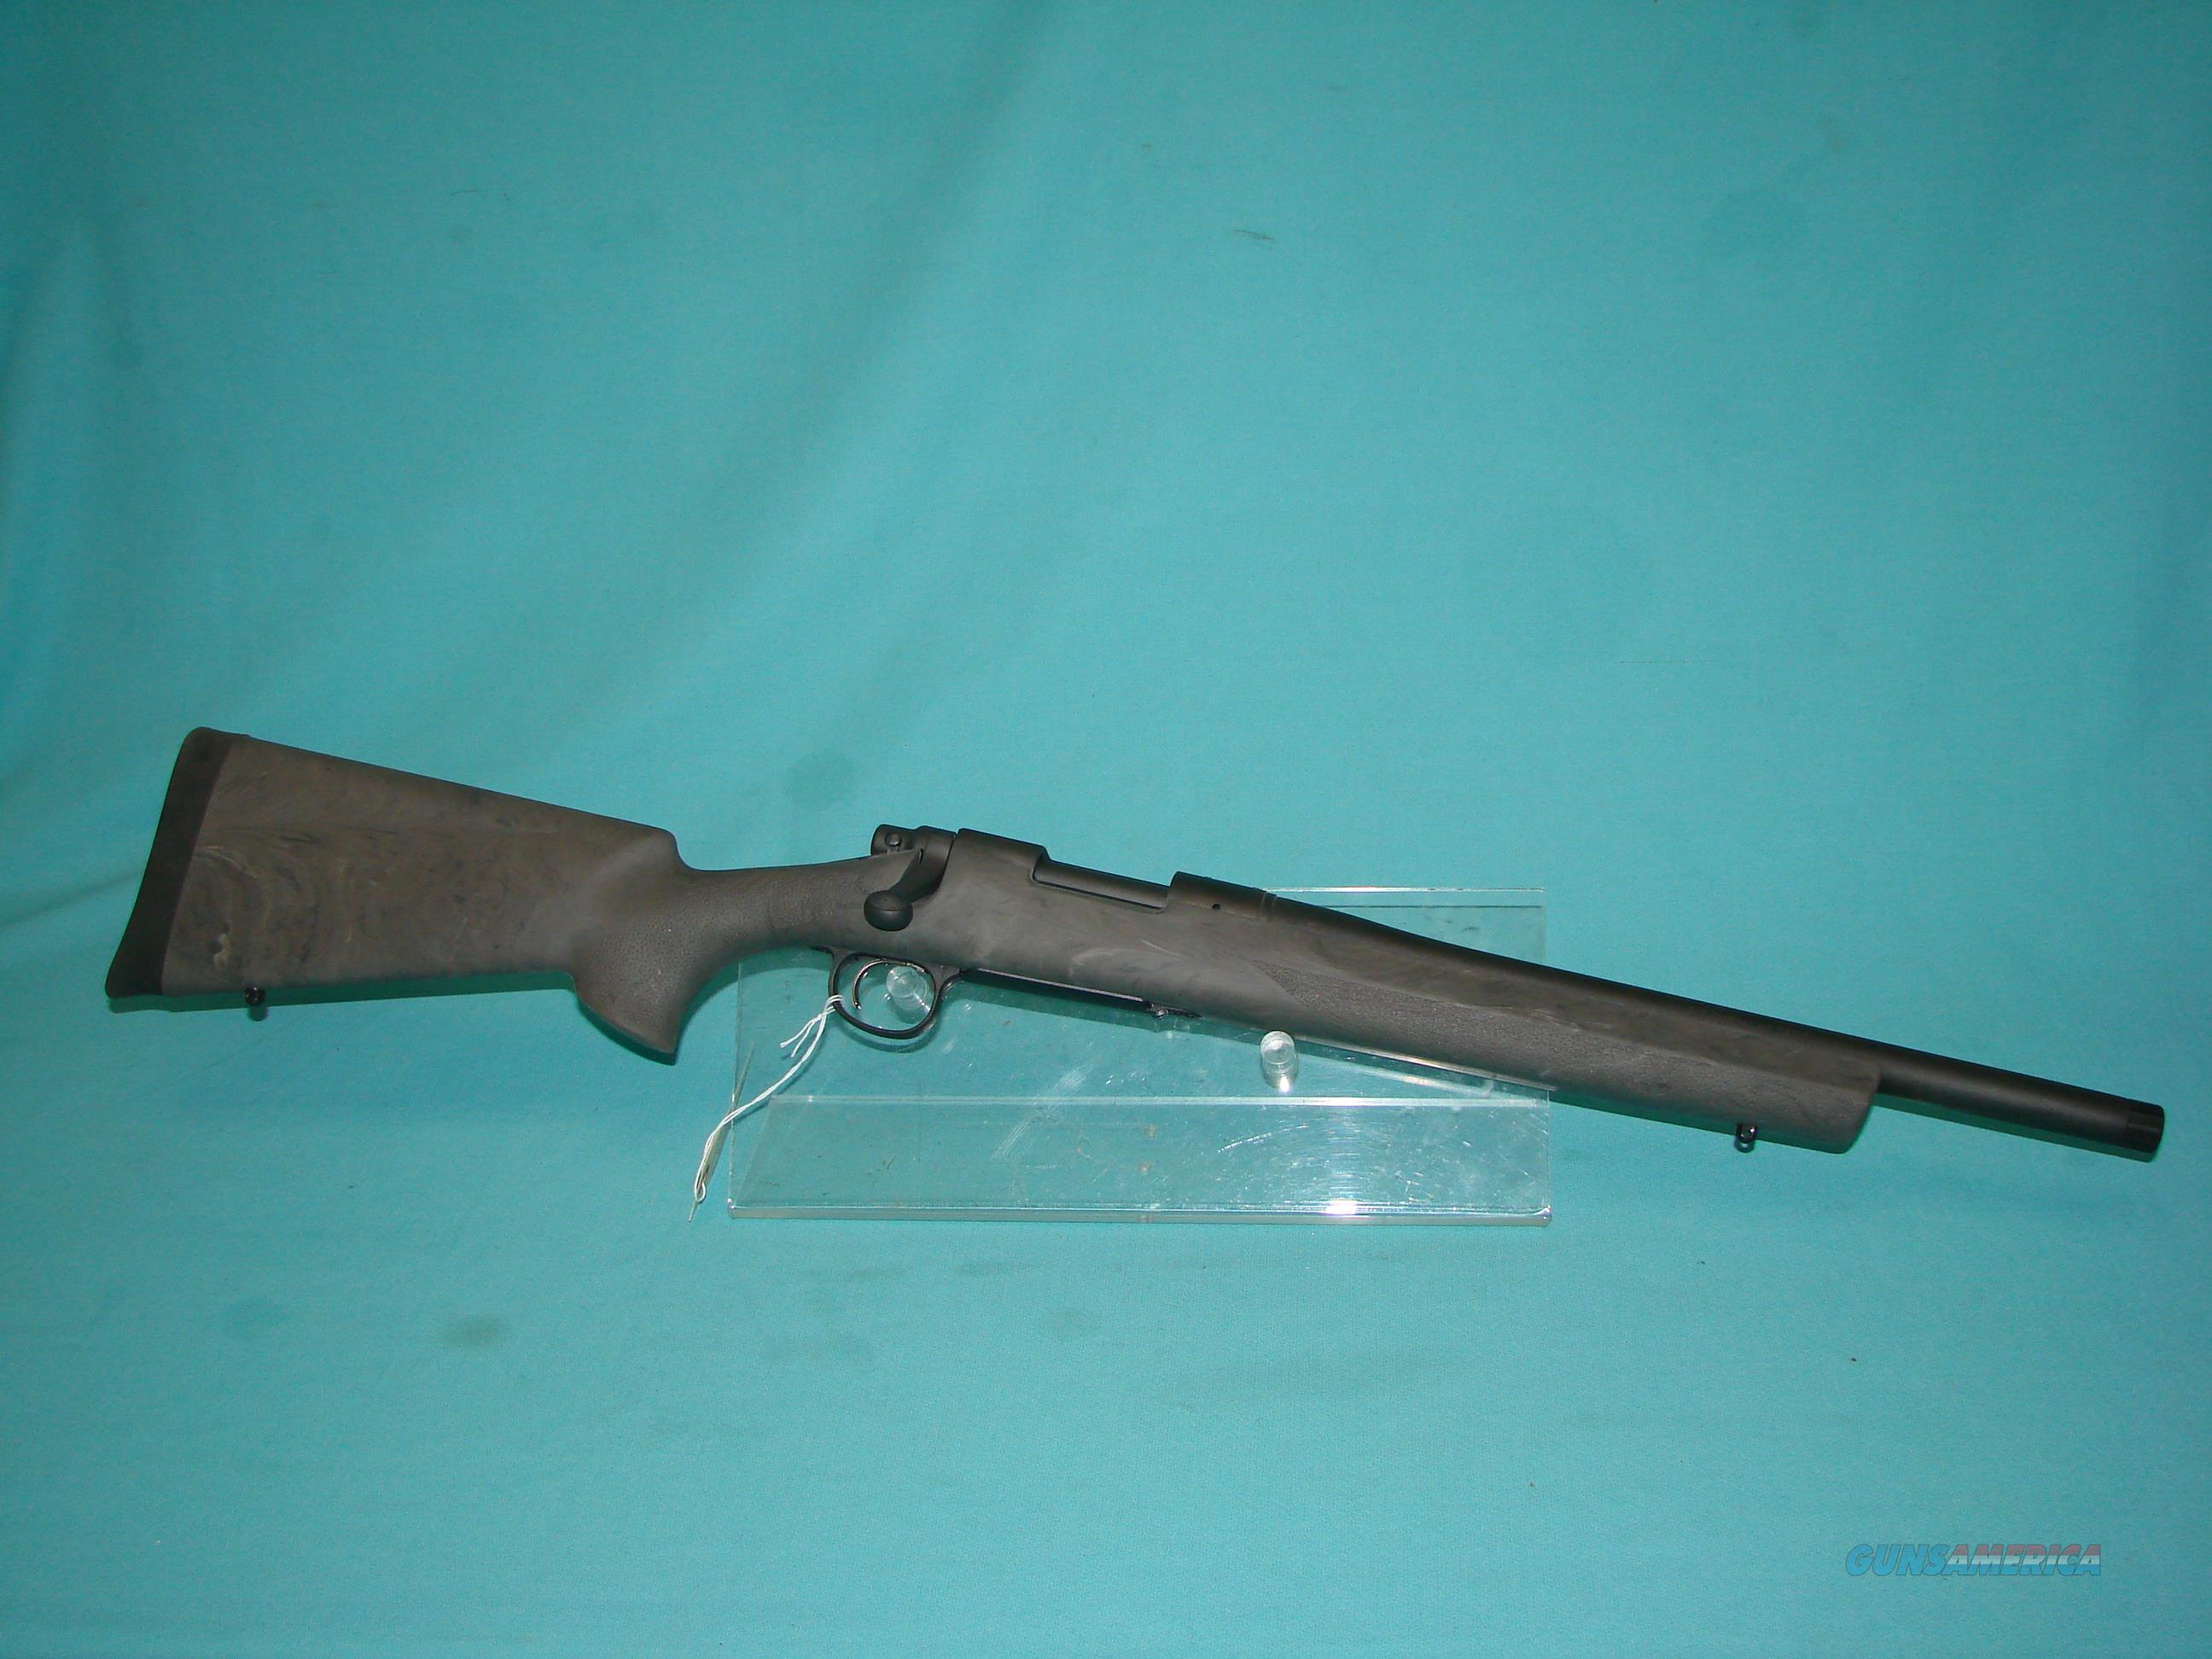 Remington 700AAC-SD  Guns > Rifles > Remington Rifles - Modern > Model 700 > Tactical